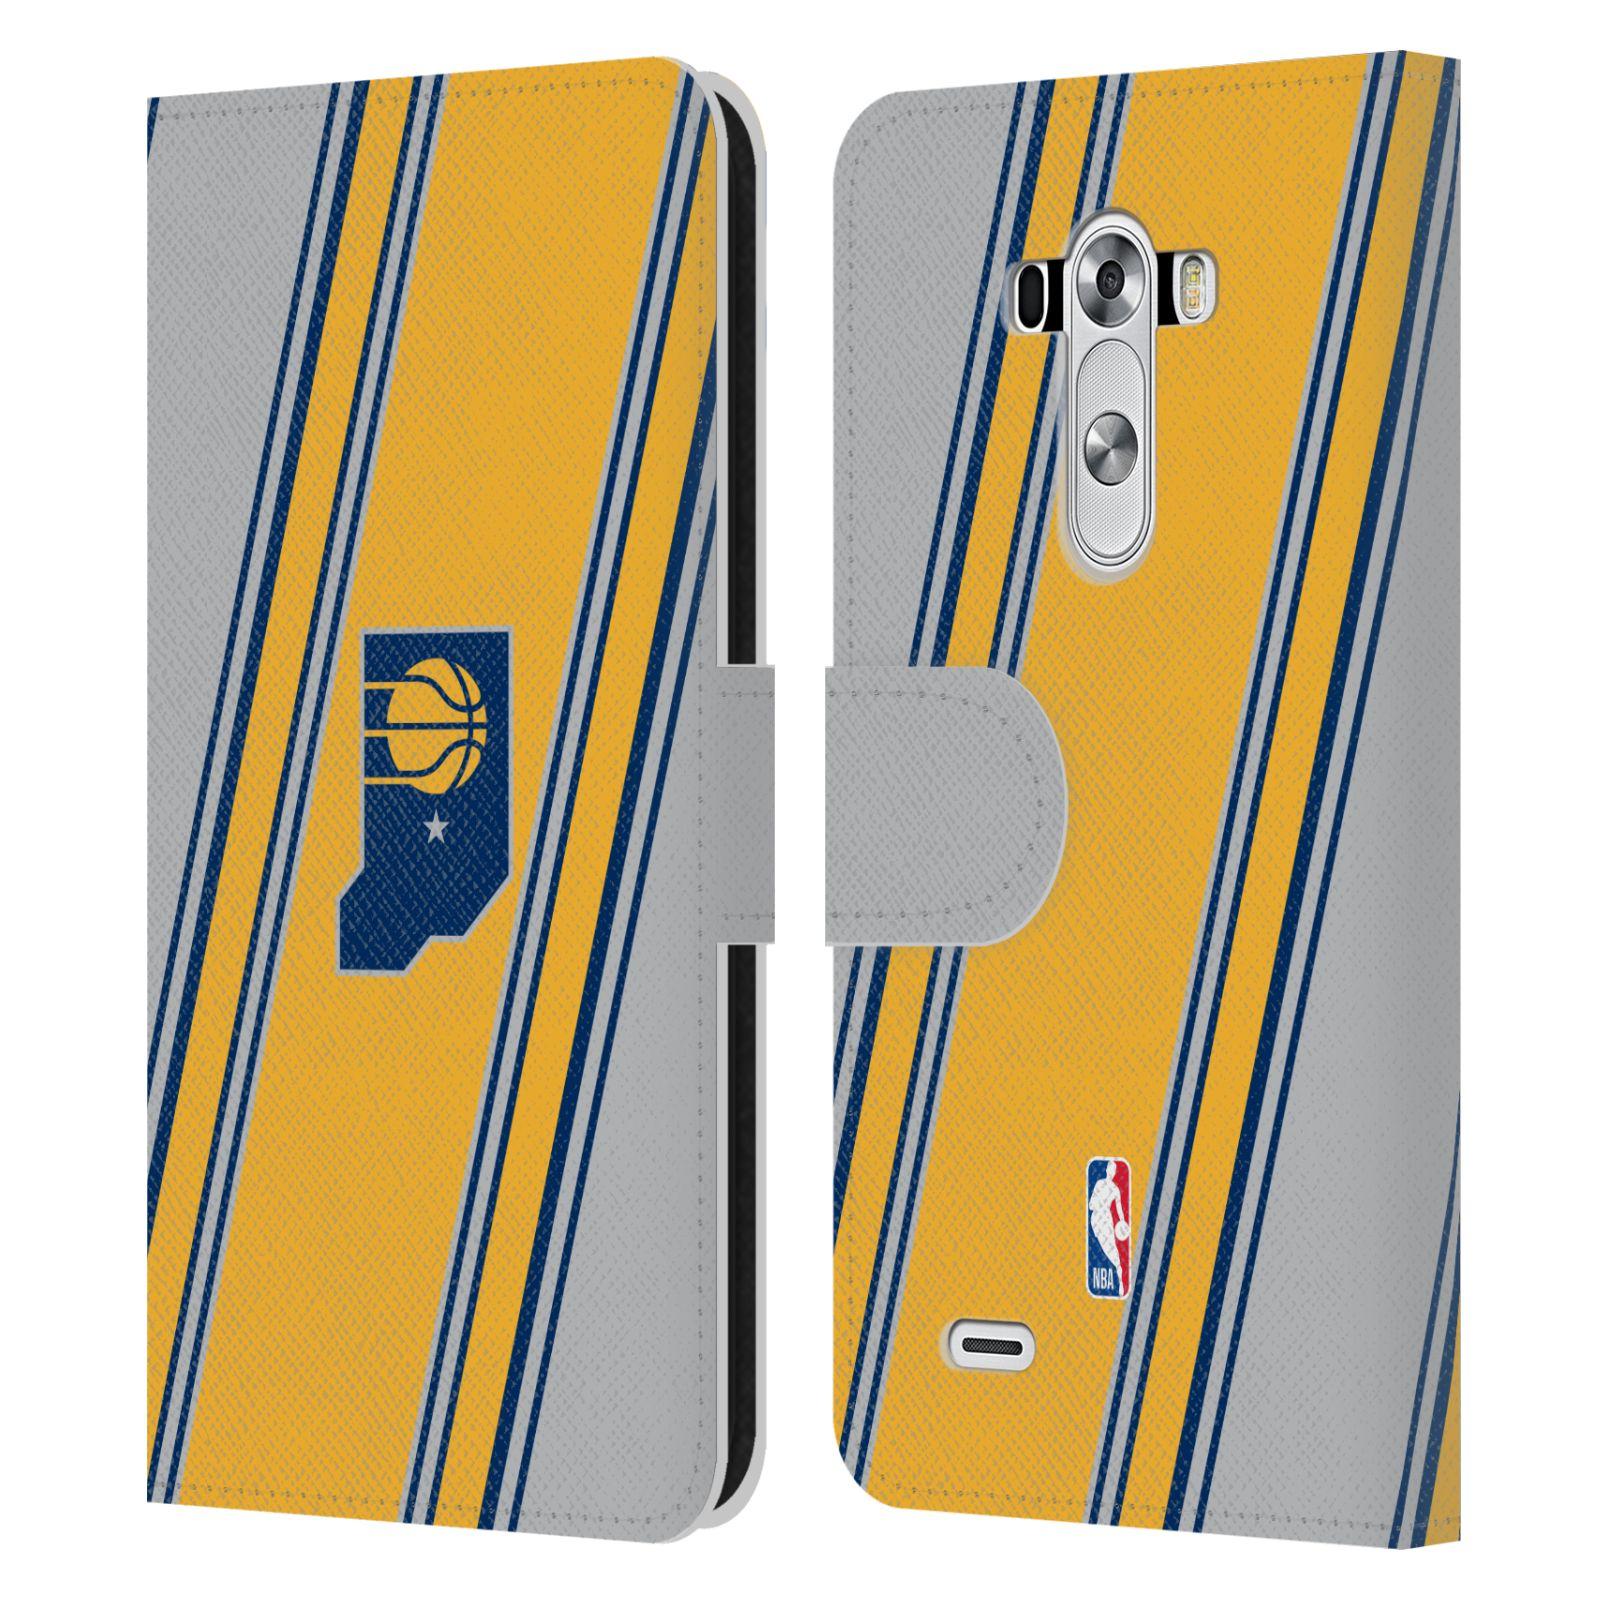 UFFICIALE-NBA-INDIANA-PACERS-COVER-A-PORTAFOGLIO-IN-PELLE-PER-LG-TELEFONI-1